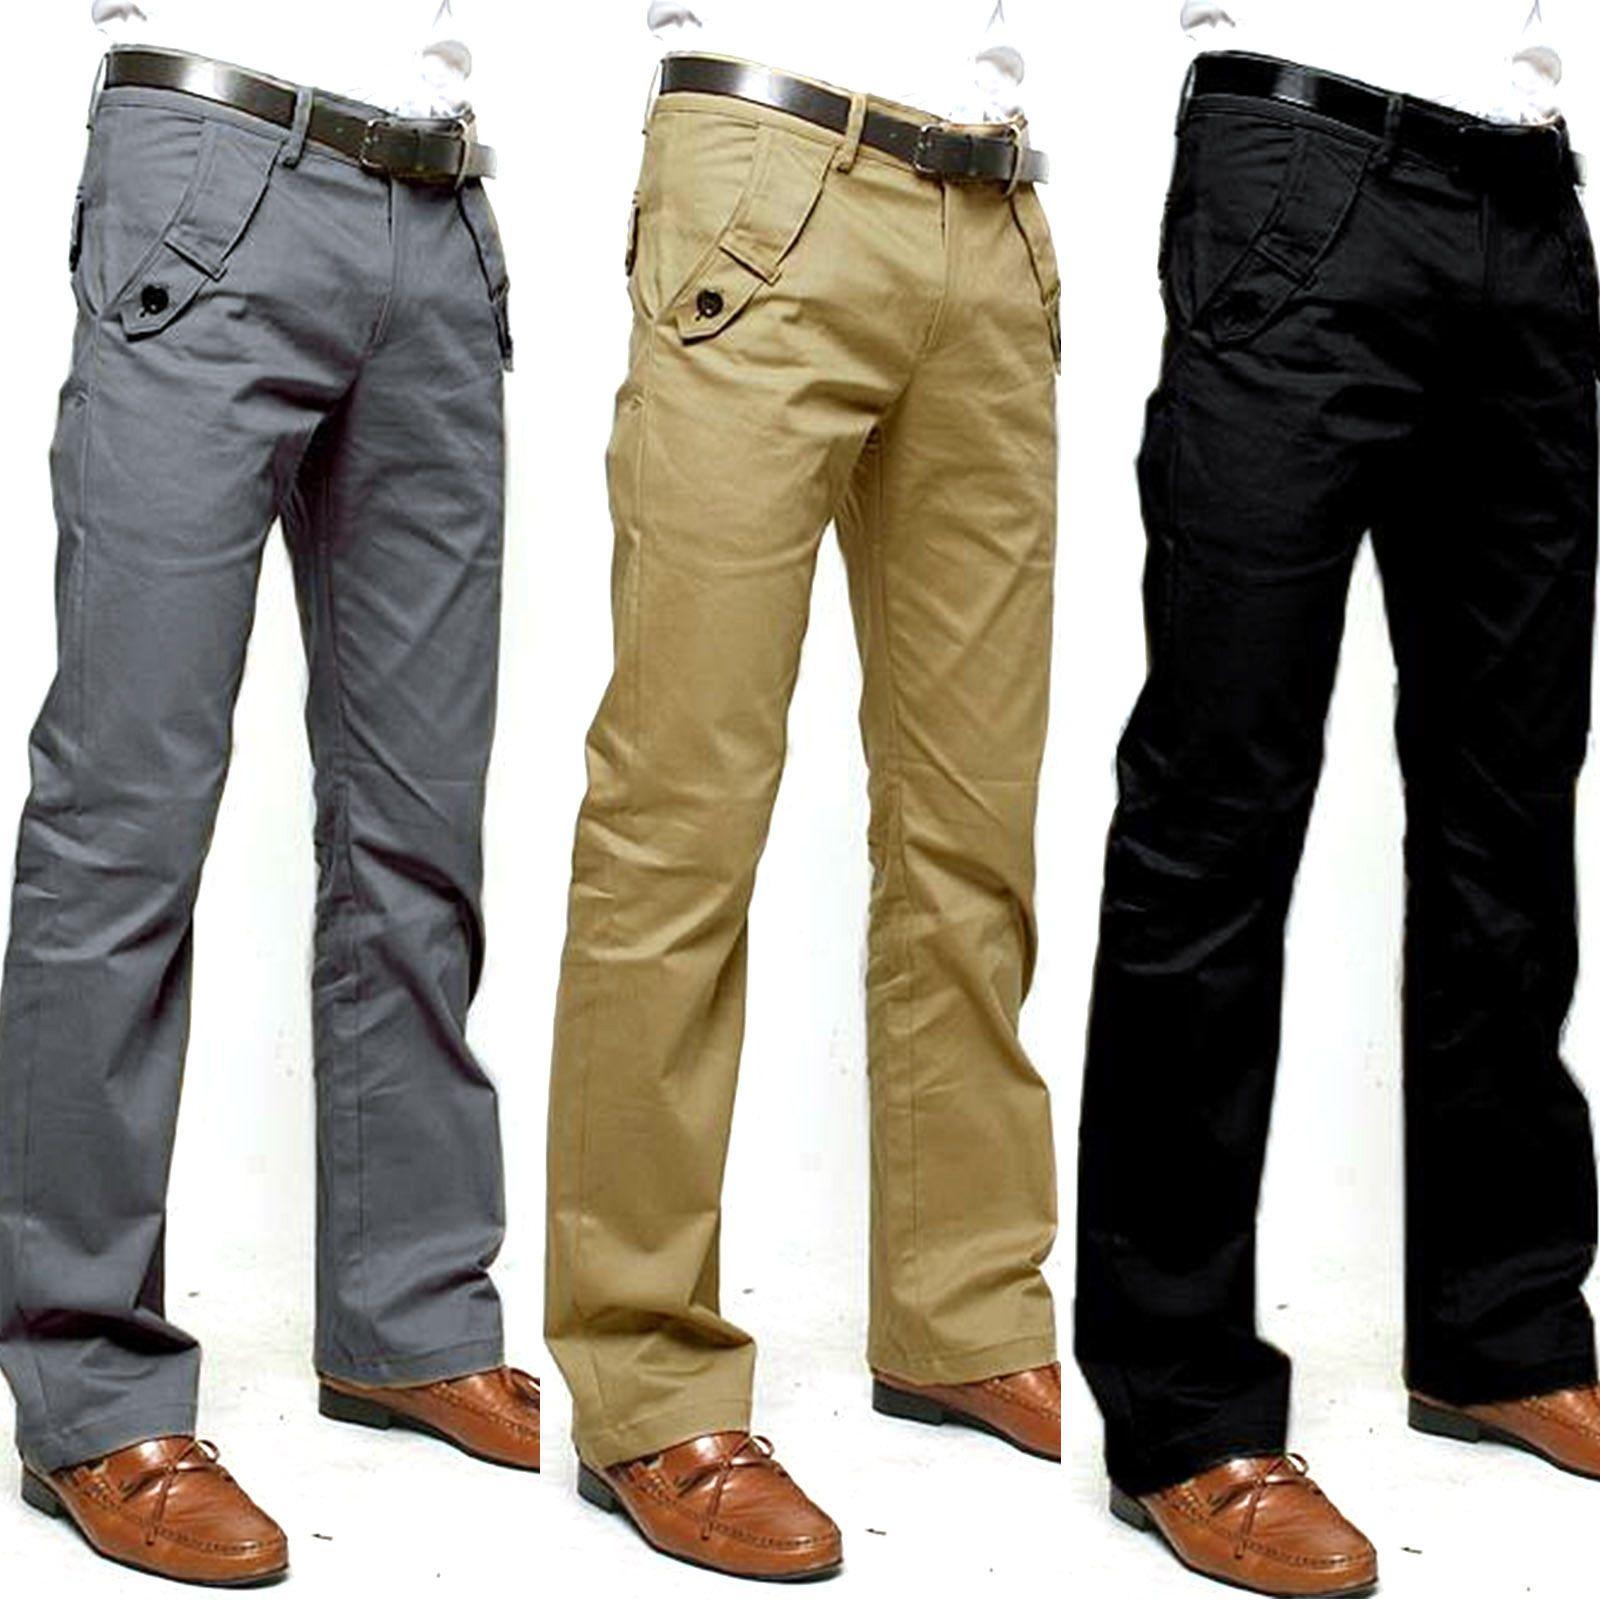 Leisure Pocket Work Trousers. Formal Dress Pants Men Casual Slim Fit  Straight Leg. Item Size Waist Hips Thigh Leg Length. Item Color  Black 0b1d030847d8